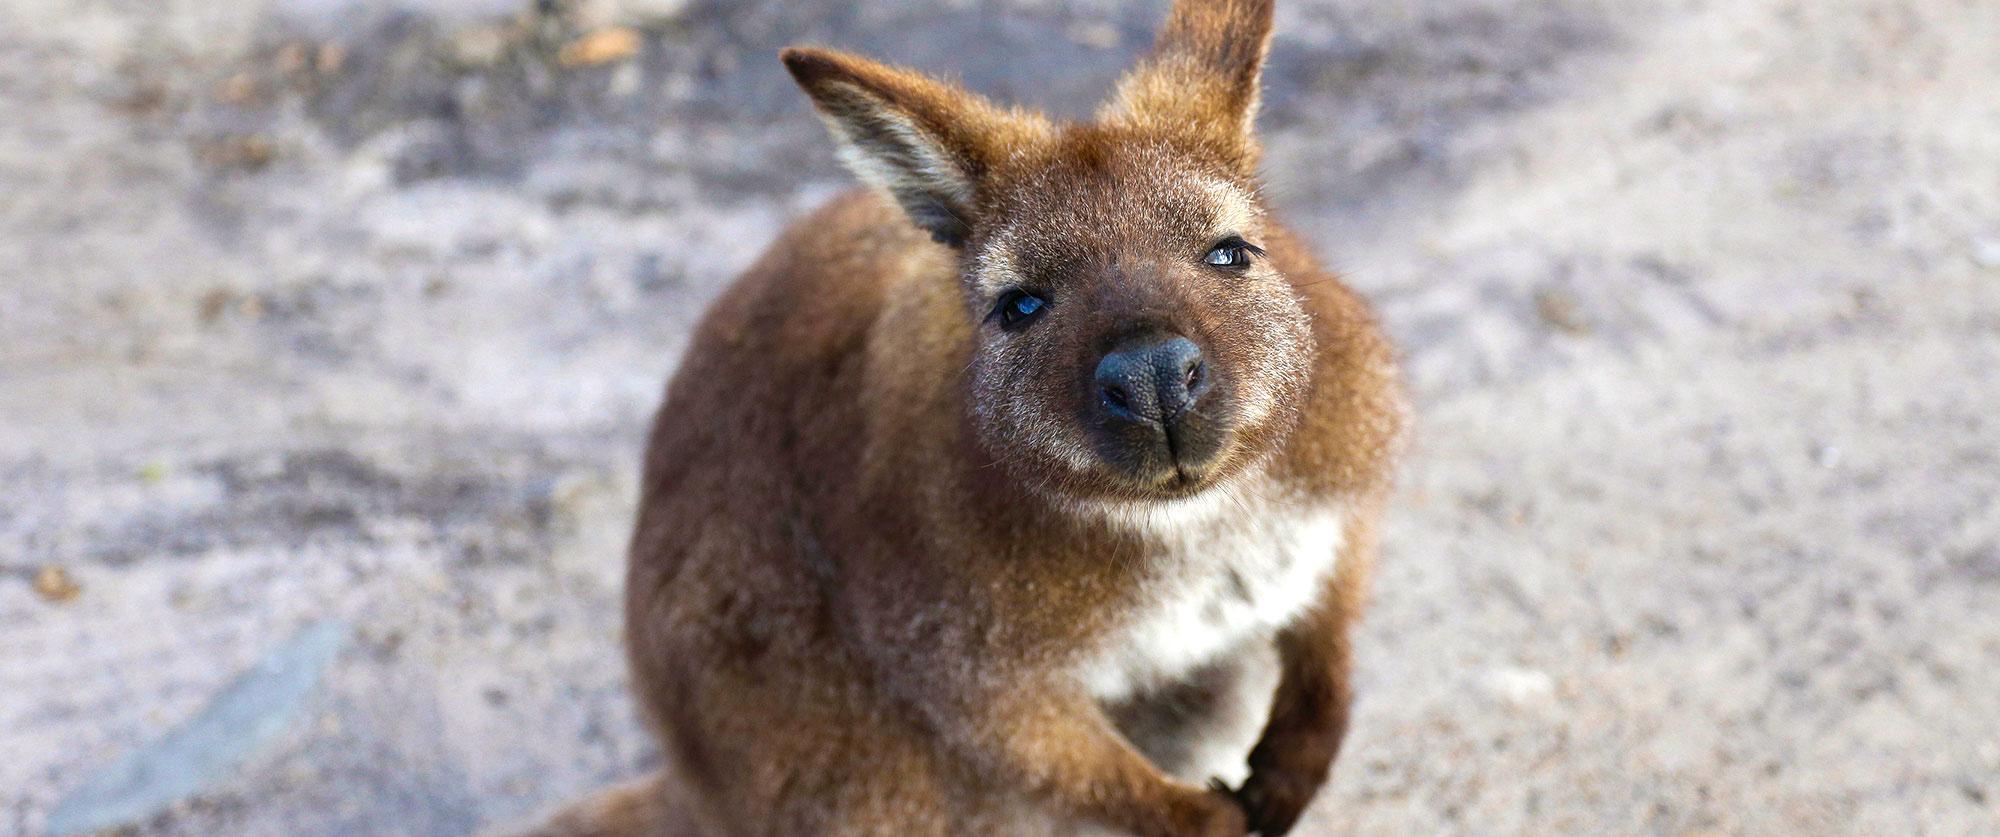 Tasmania, Australia Vacation: Ultimate Wildlife Experience